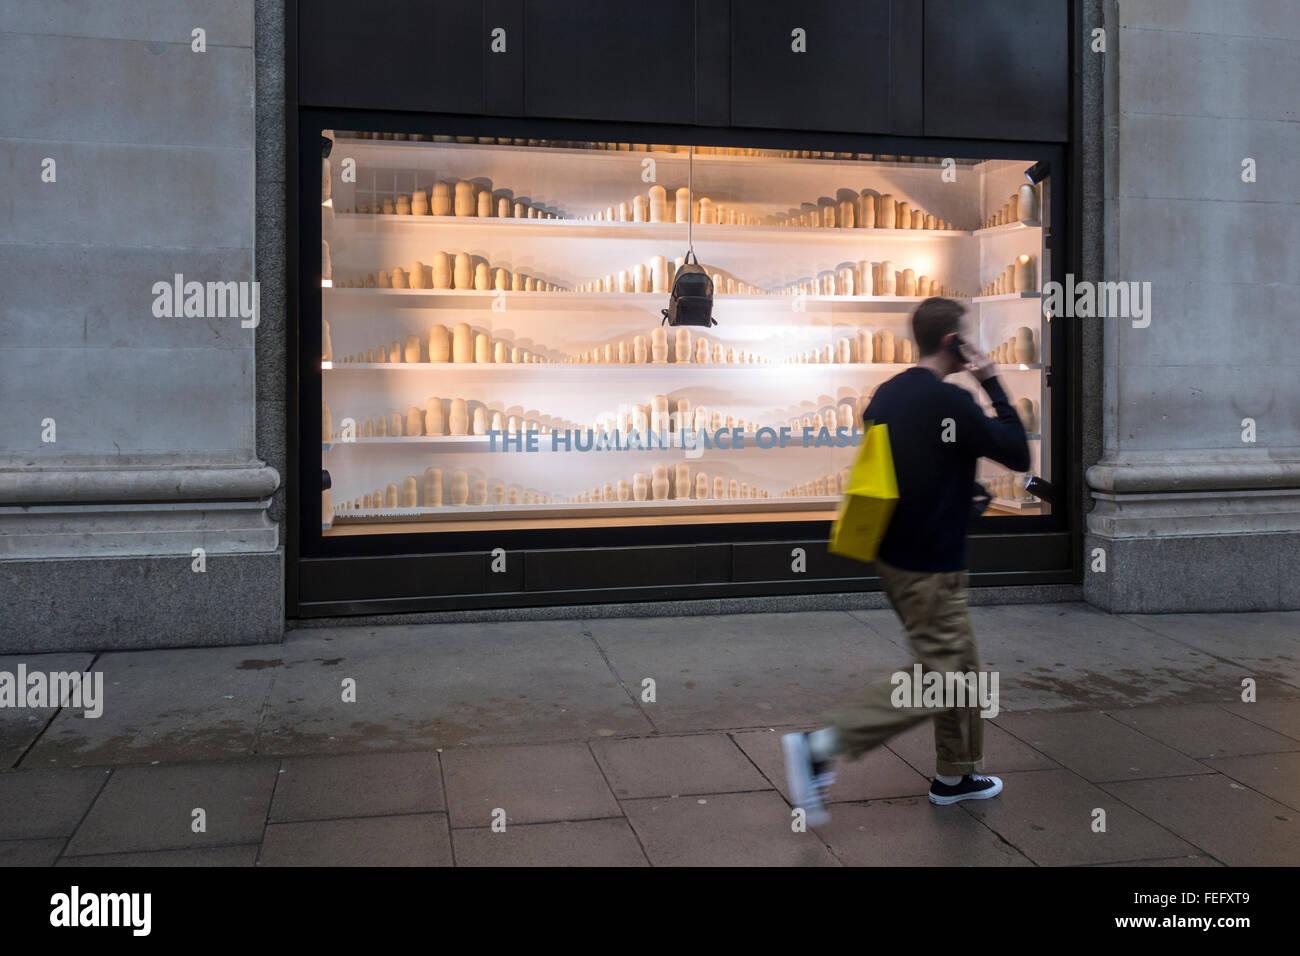 Selfridges window January 2016, Oxford Street, London, UK - Stock Image